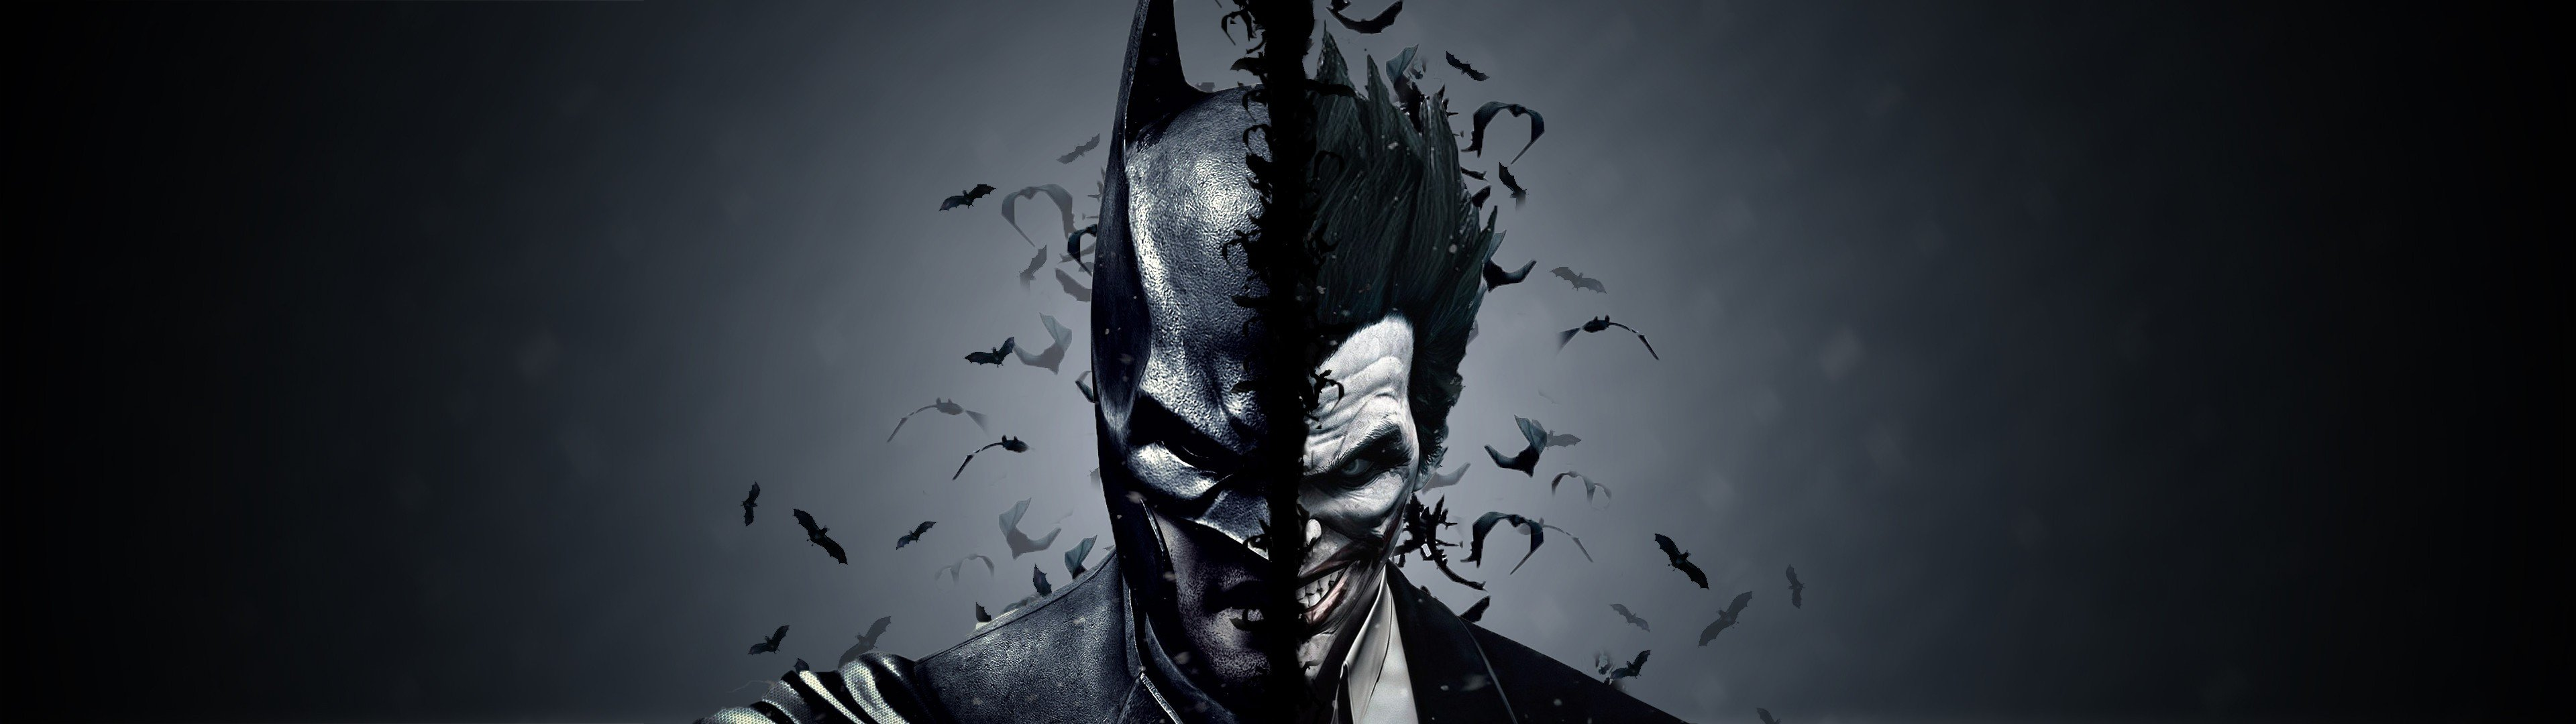 Joker Multiple Display Dual Monitors Batman Begins Hd